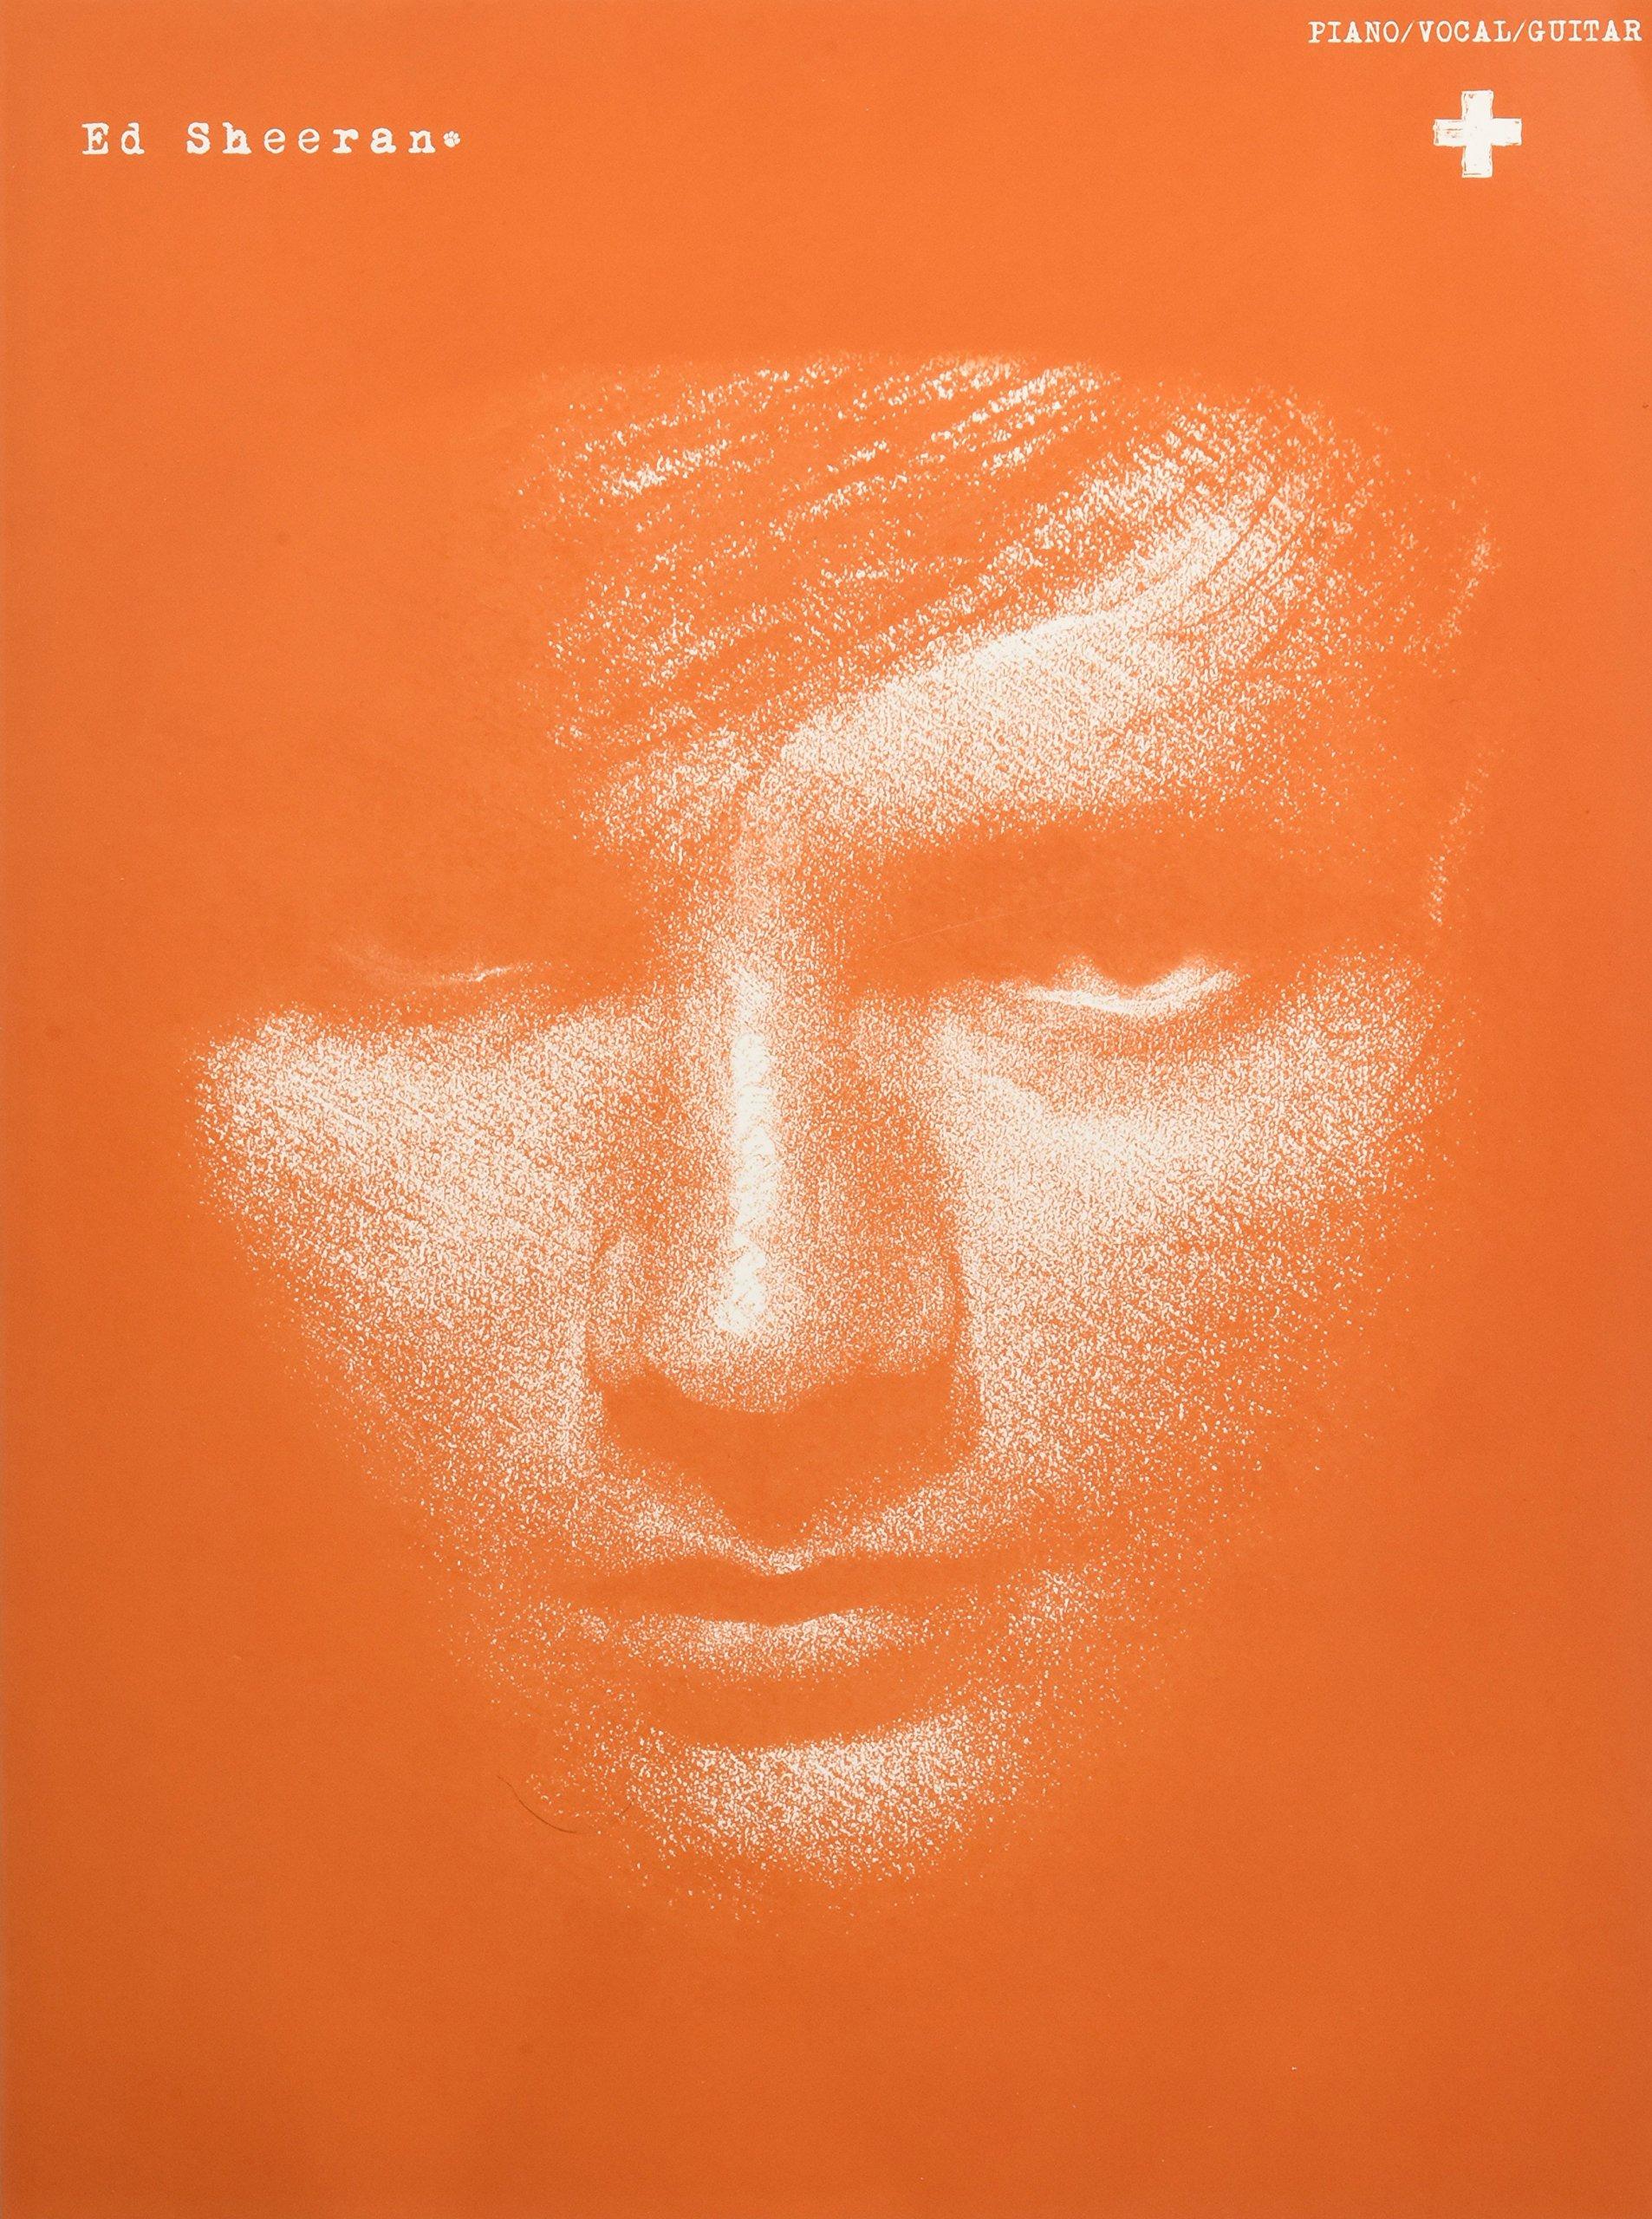 Ed Sheeran + PVG Songbook für Klavier, Gesang, Gitarre ...